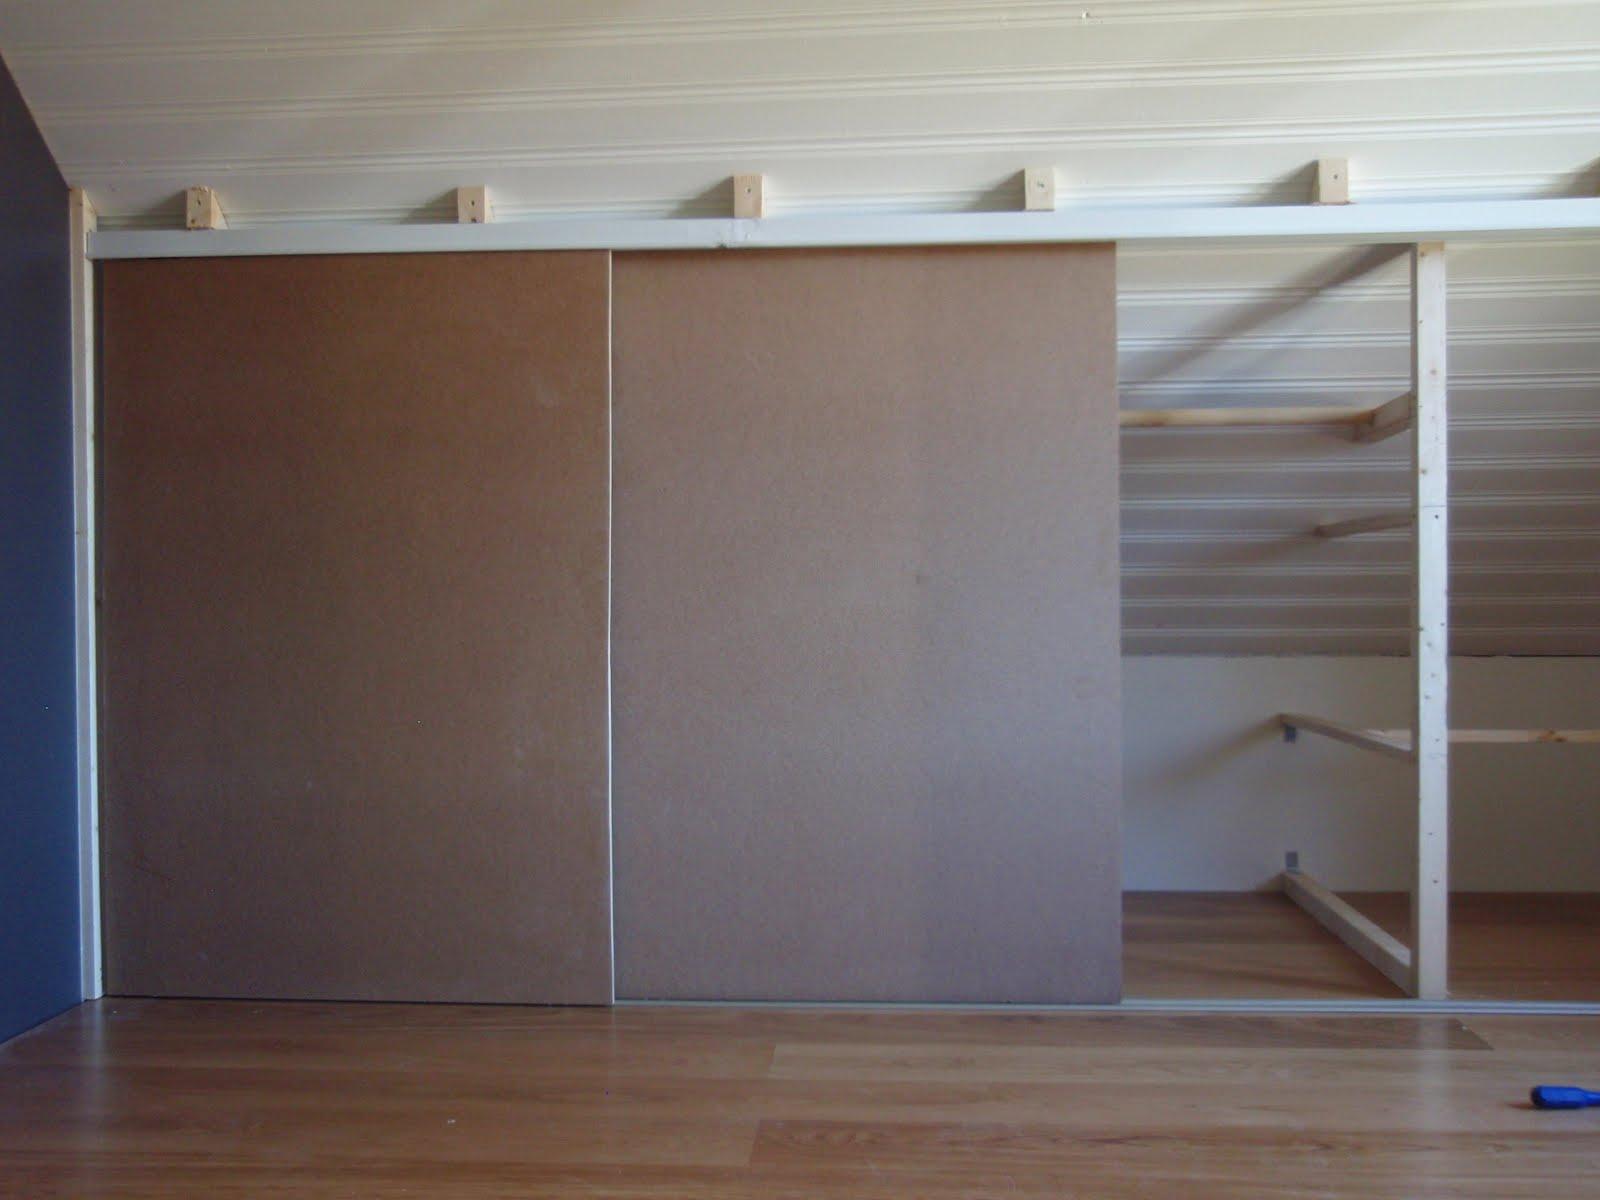 Nordlyckan Platsbyggd Garderob